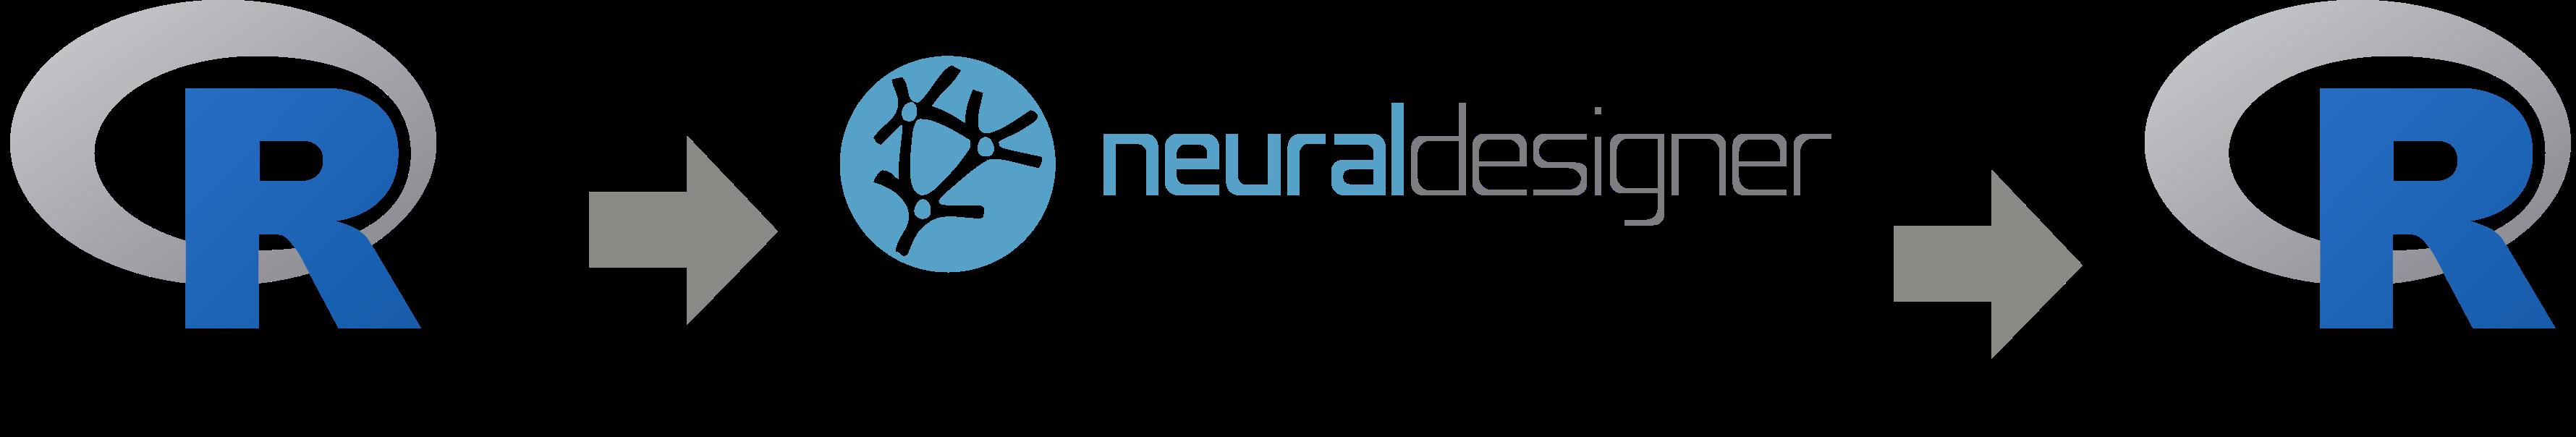 Neural Designer and R logos